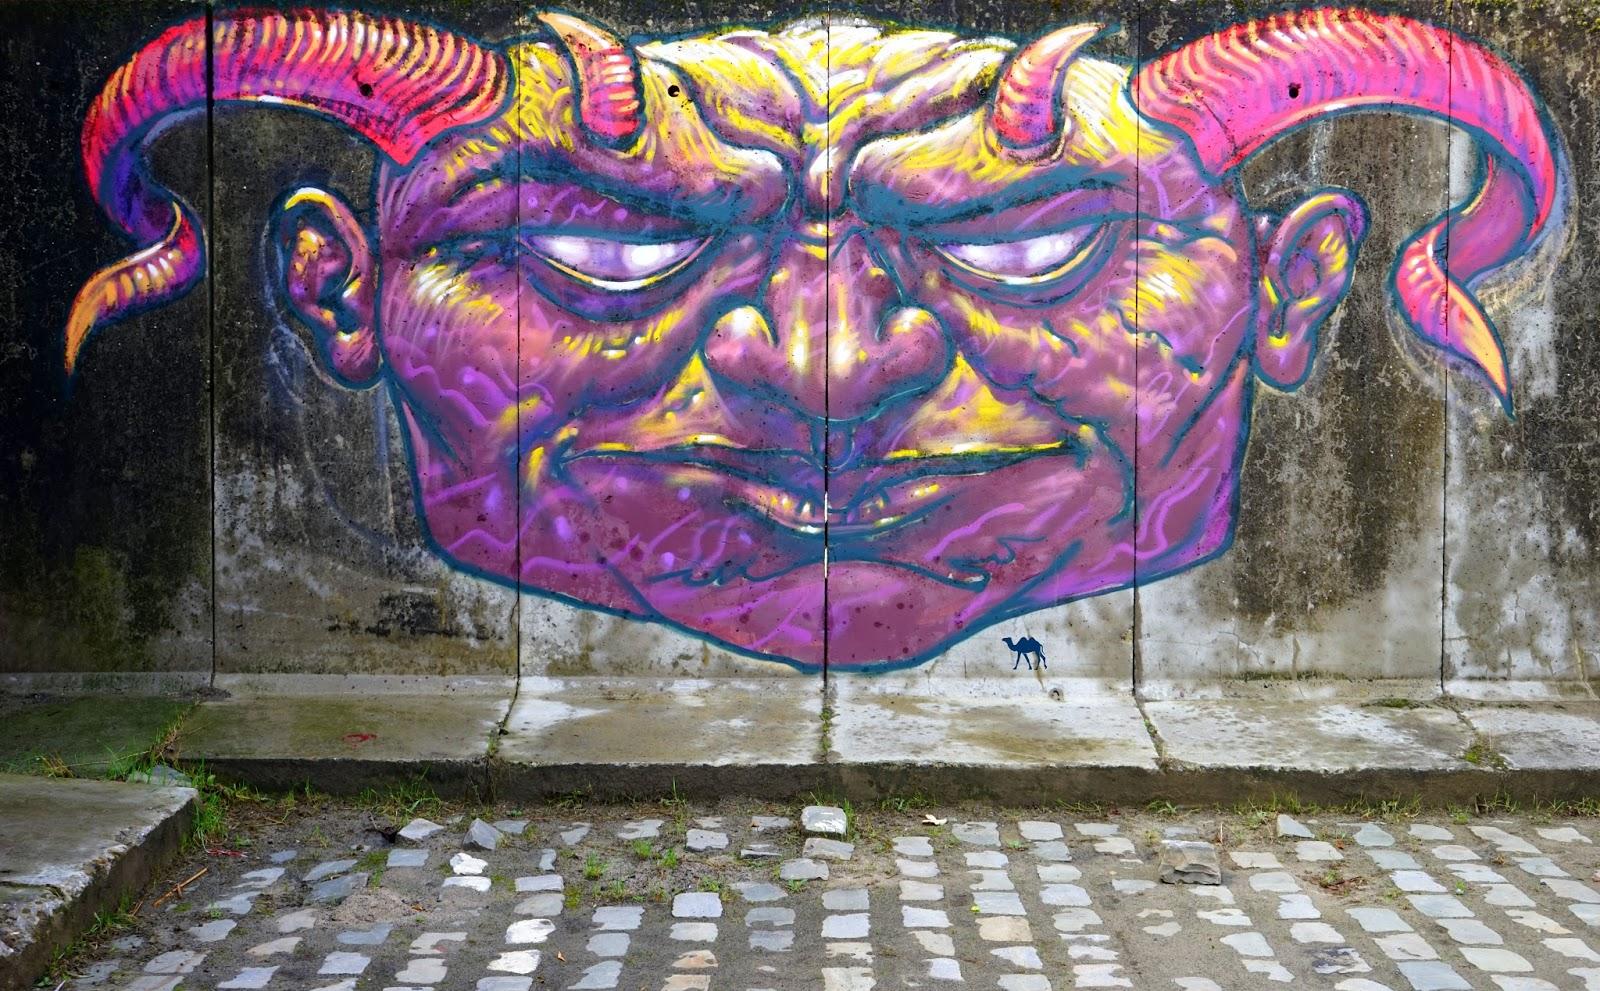 Le Chameau Bleu - Blog Voyage Gand Belgique - Gent Glas - Street art 2 Promenade à Gand